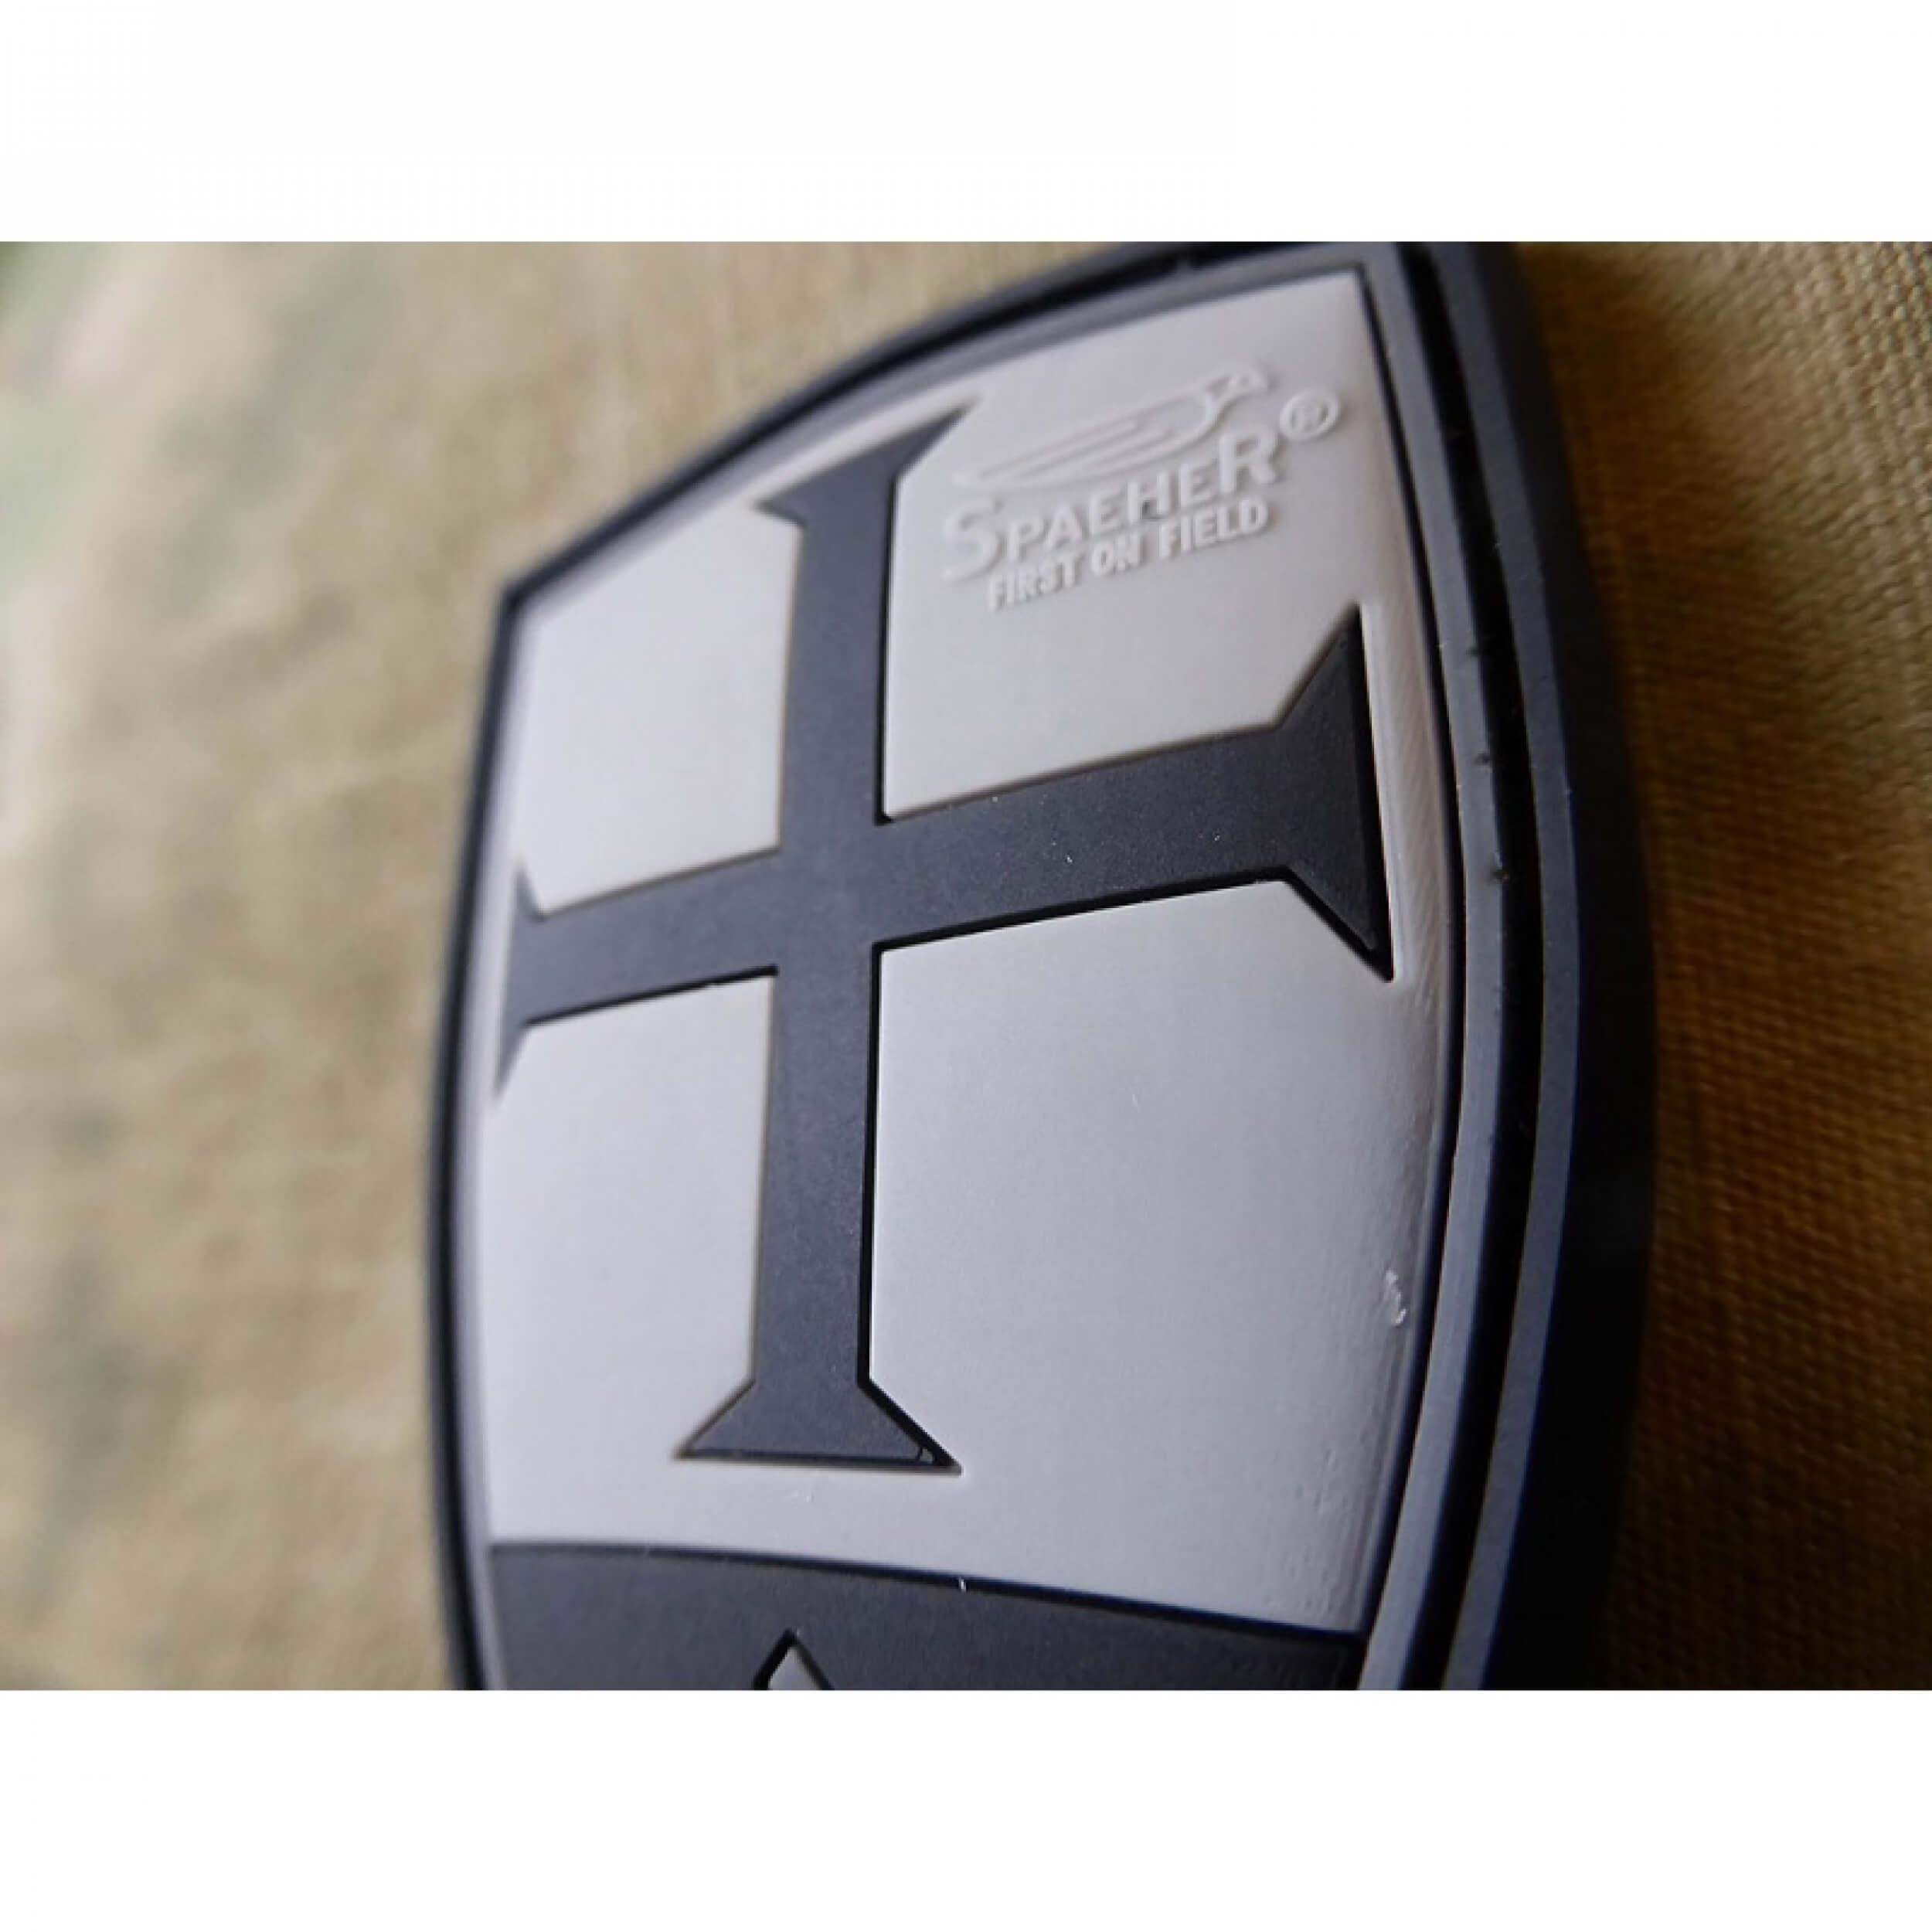 JTG Crusader Shield Patch, blackops / 3D Rubber Patch